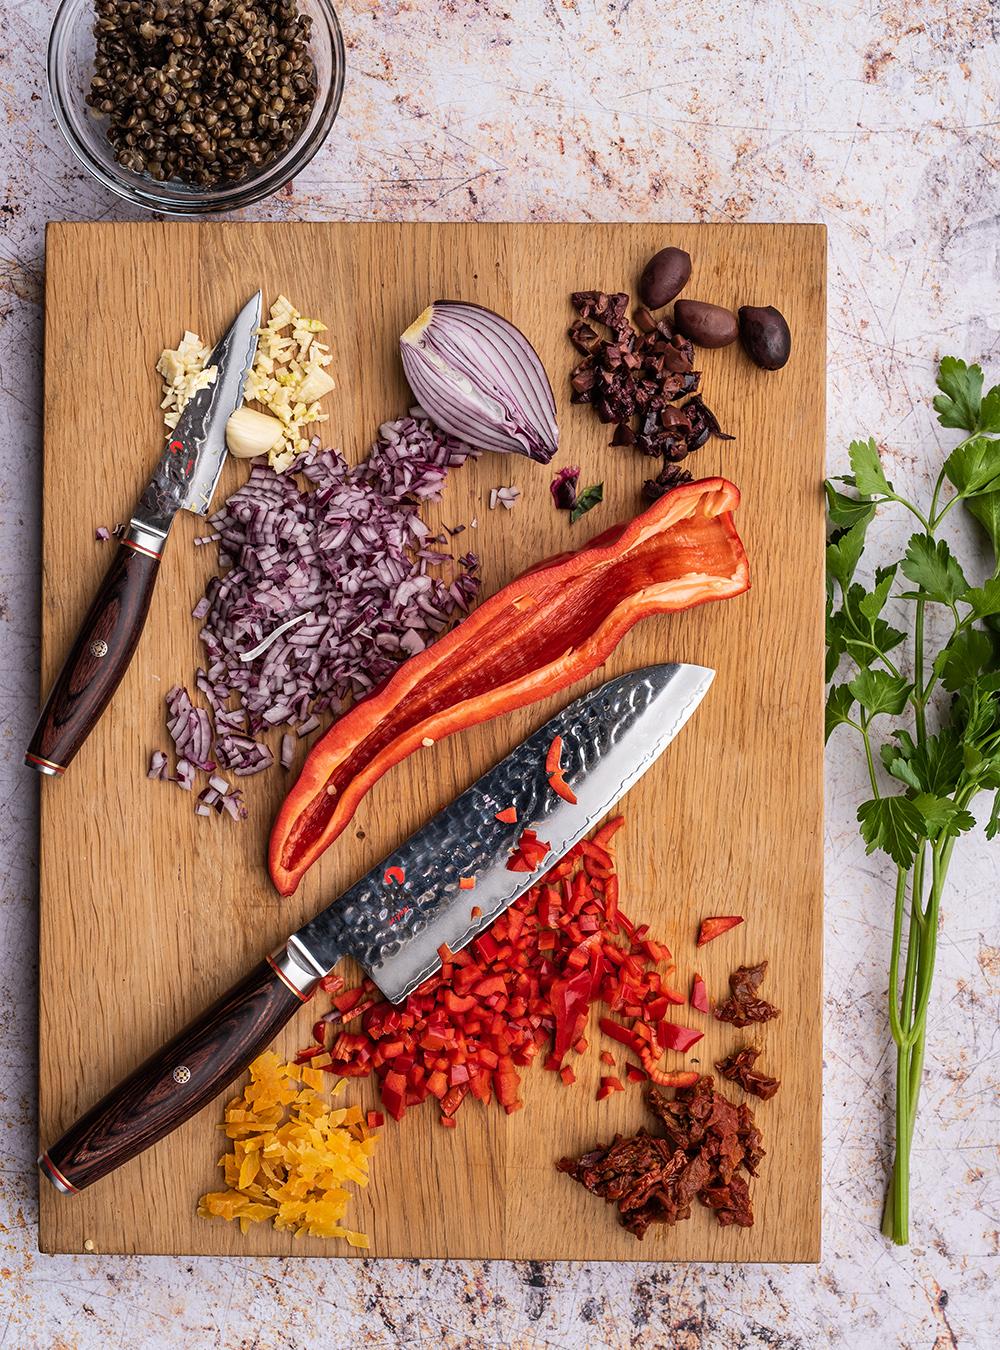 Bulgur als warme Beilage oder Bulgur Salat